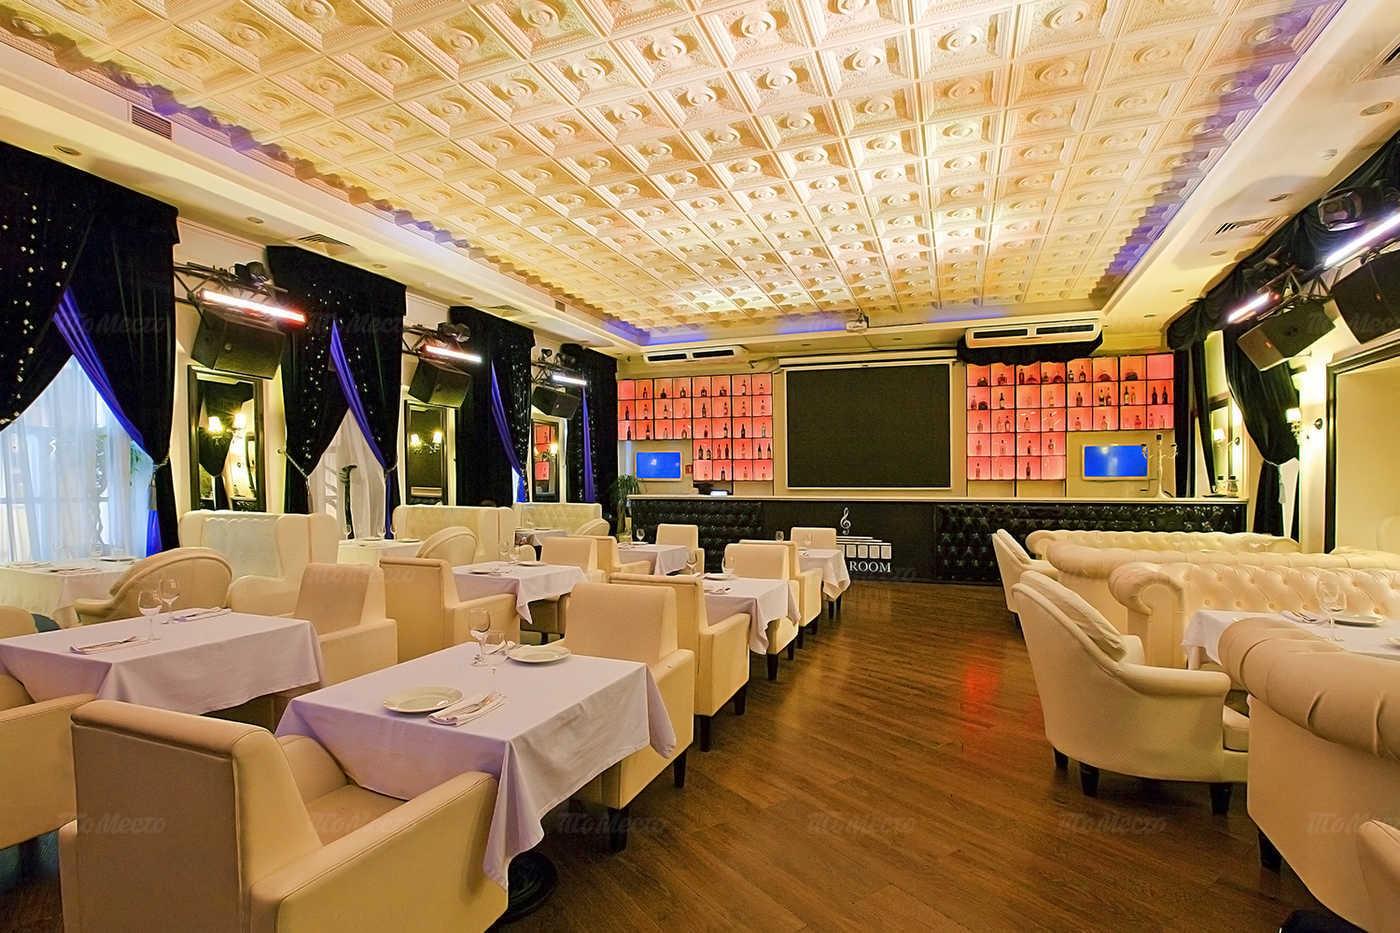 Меню караоке клуба, ресторана Music Room (бывш. Bad Room) на улице Покровка